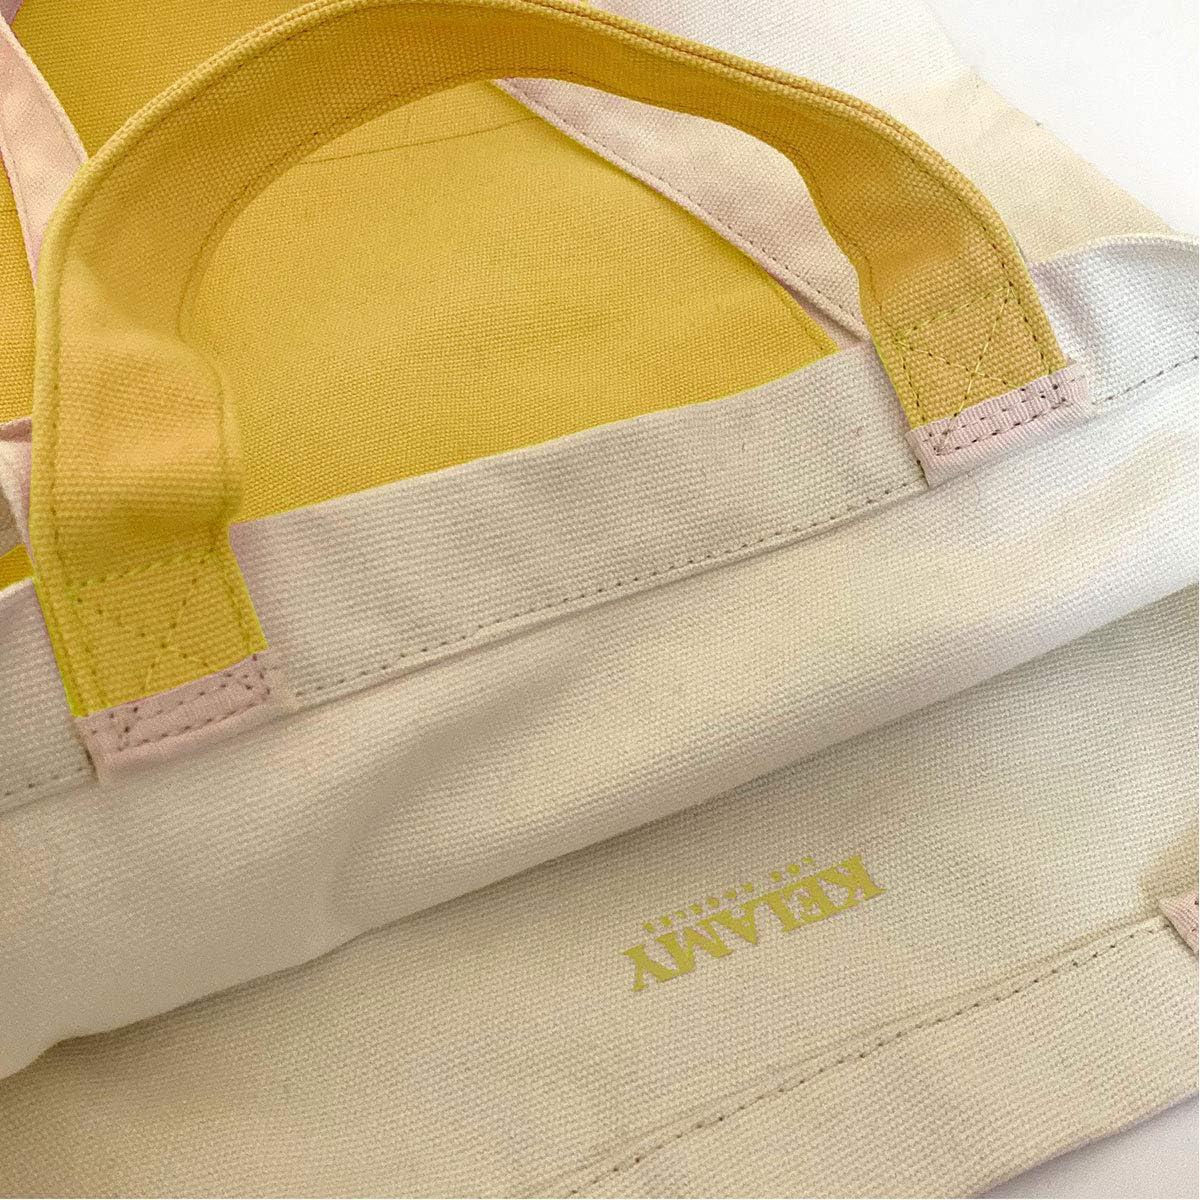 KELAMY Women Canvas Tote Handbags Shoulder Bag for Casual /& Work